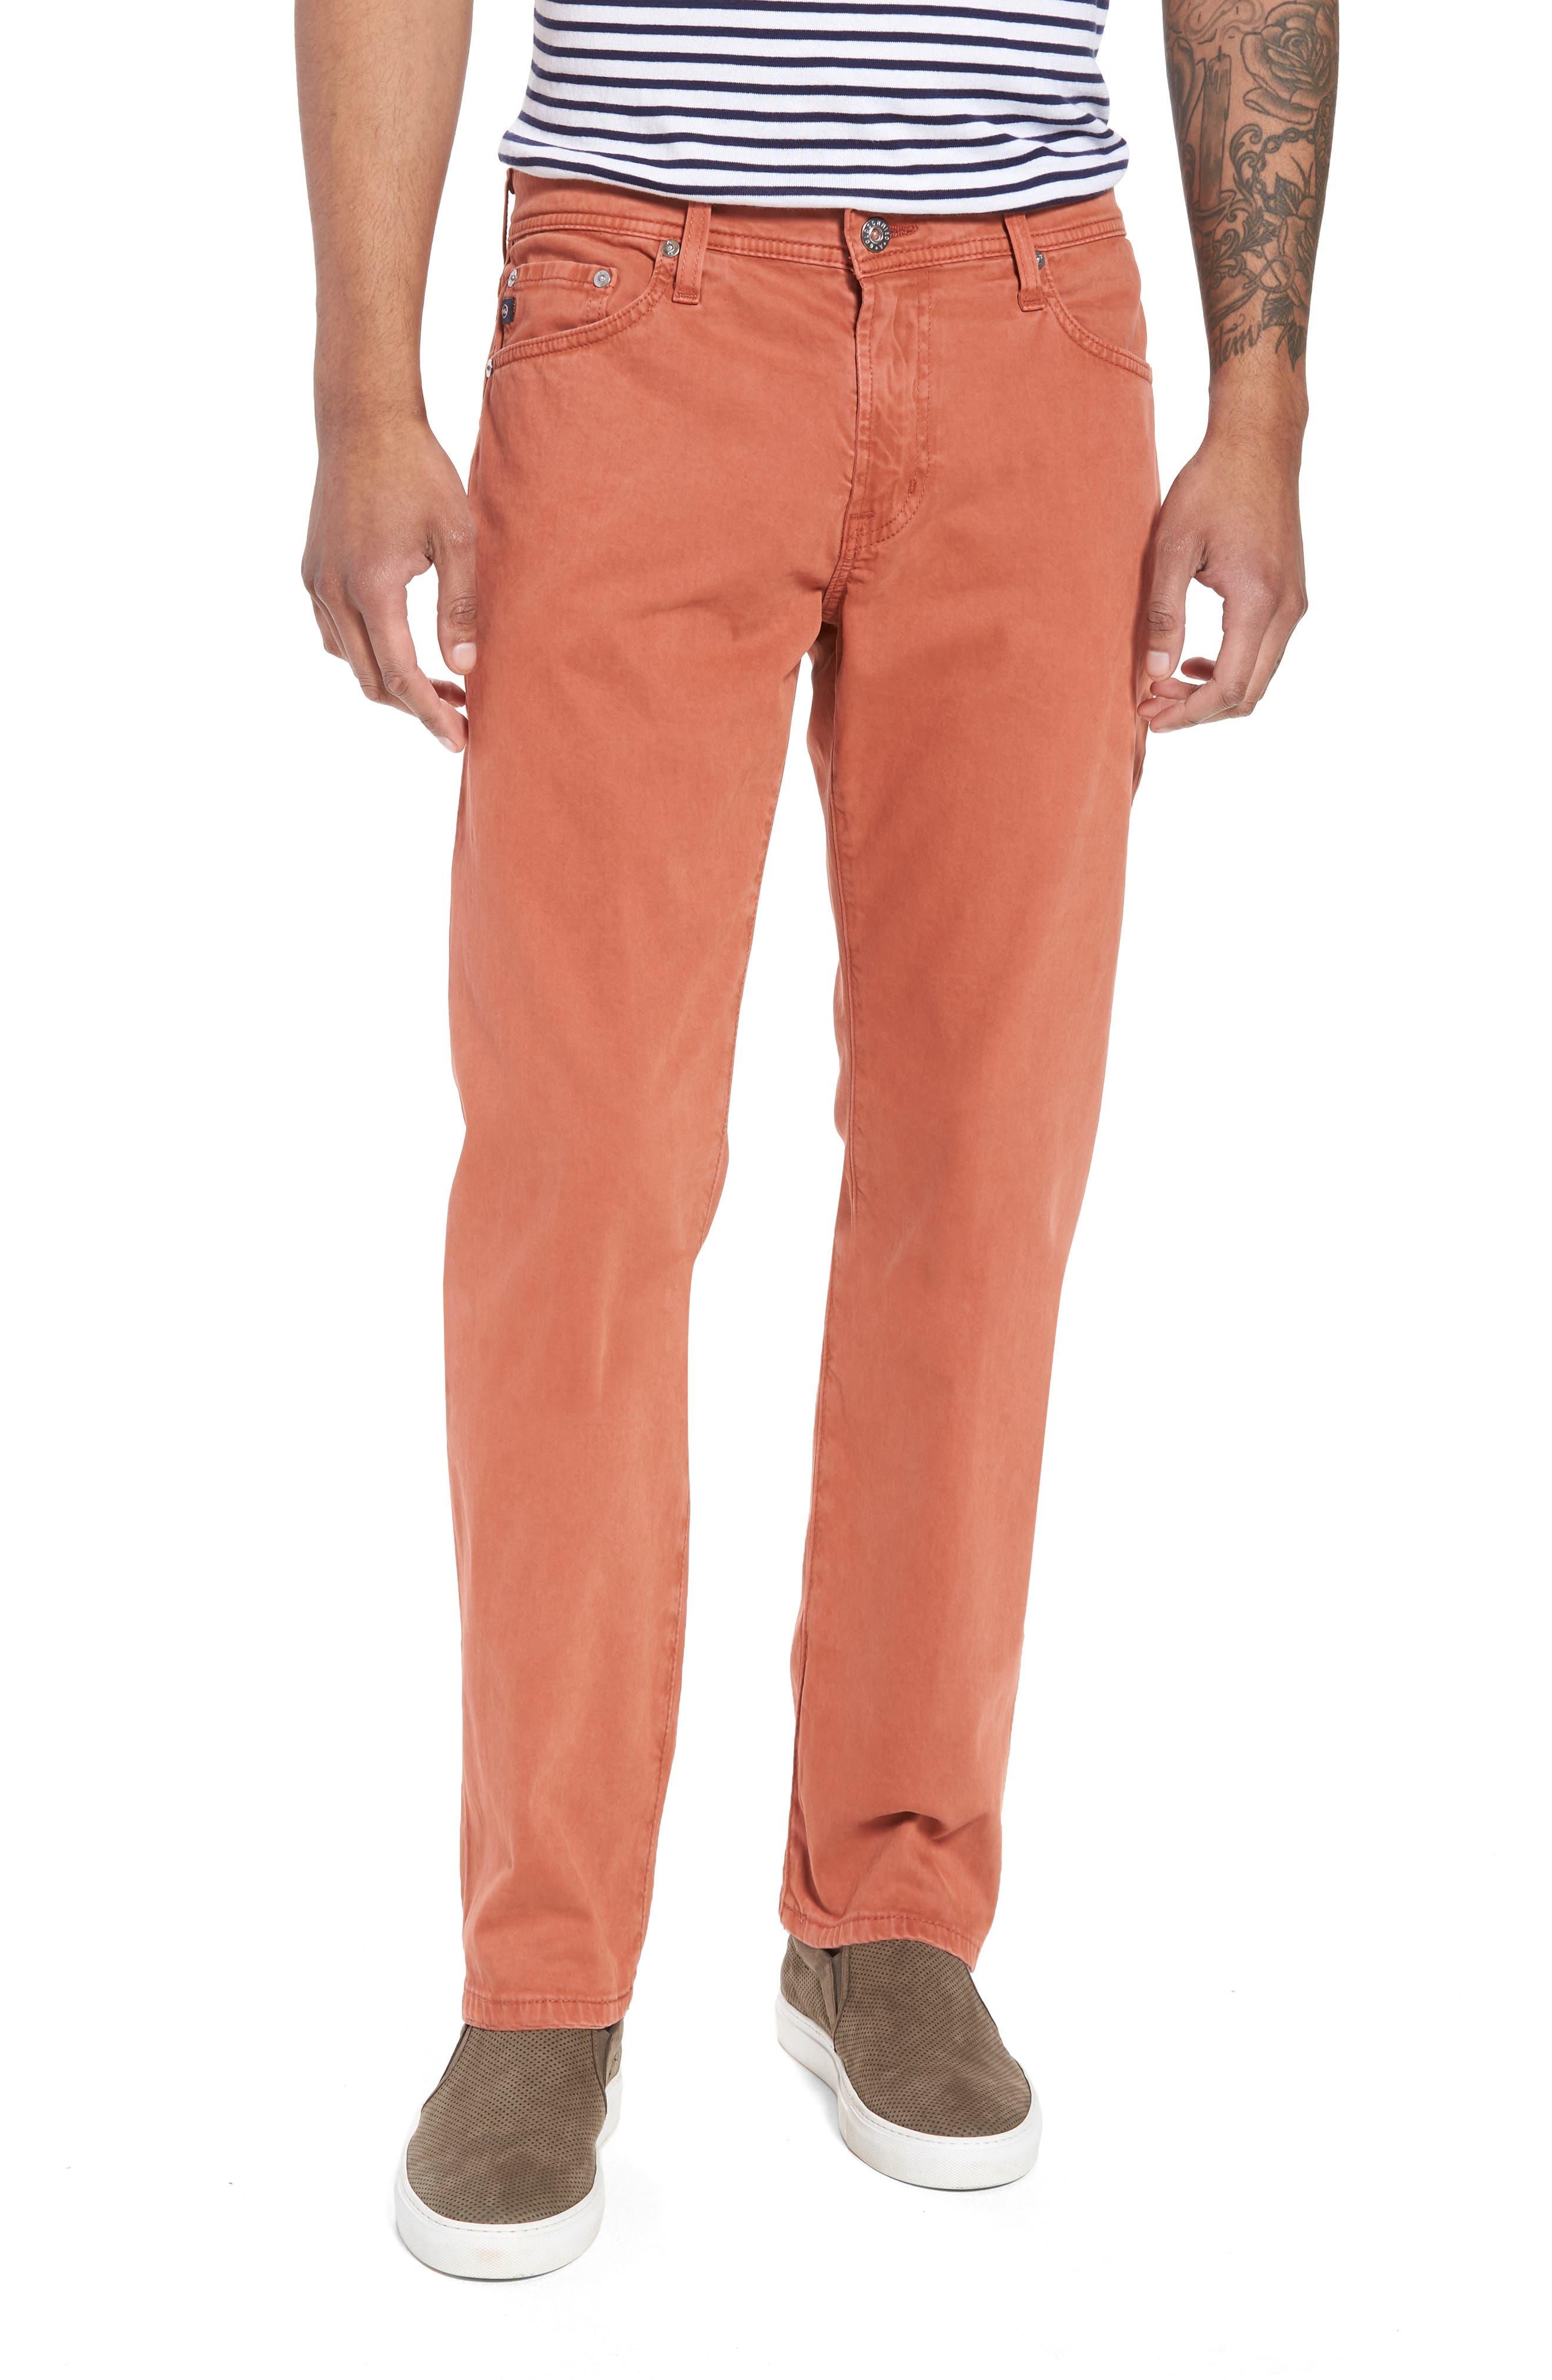 Graduate SUD Slim Straight Leg Pants,                         Main,                         color, Sulfur Rosso Red